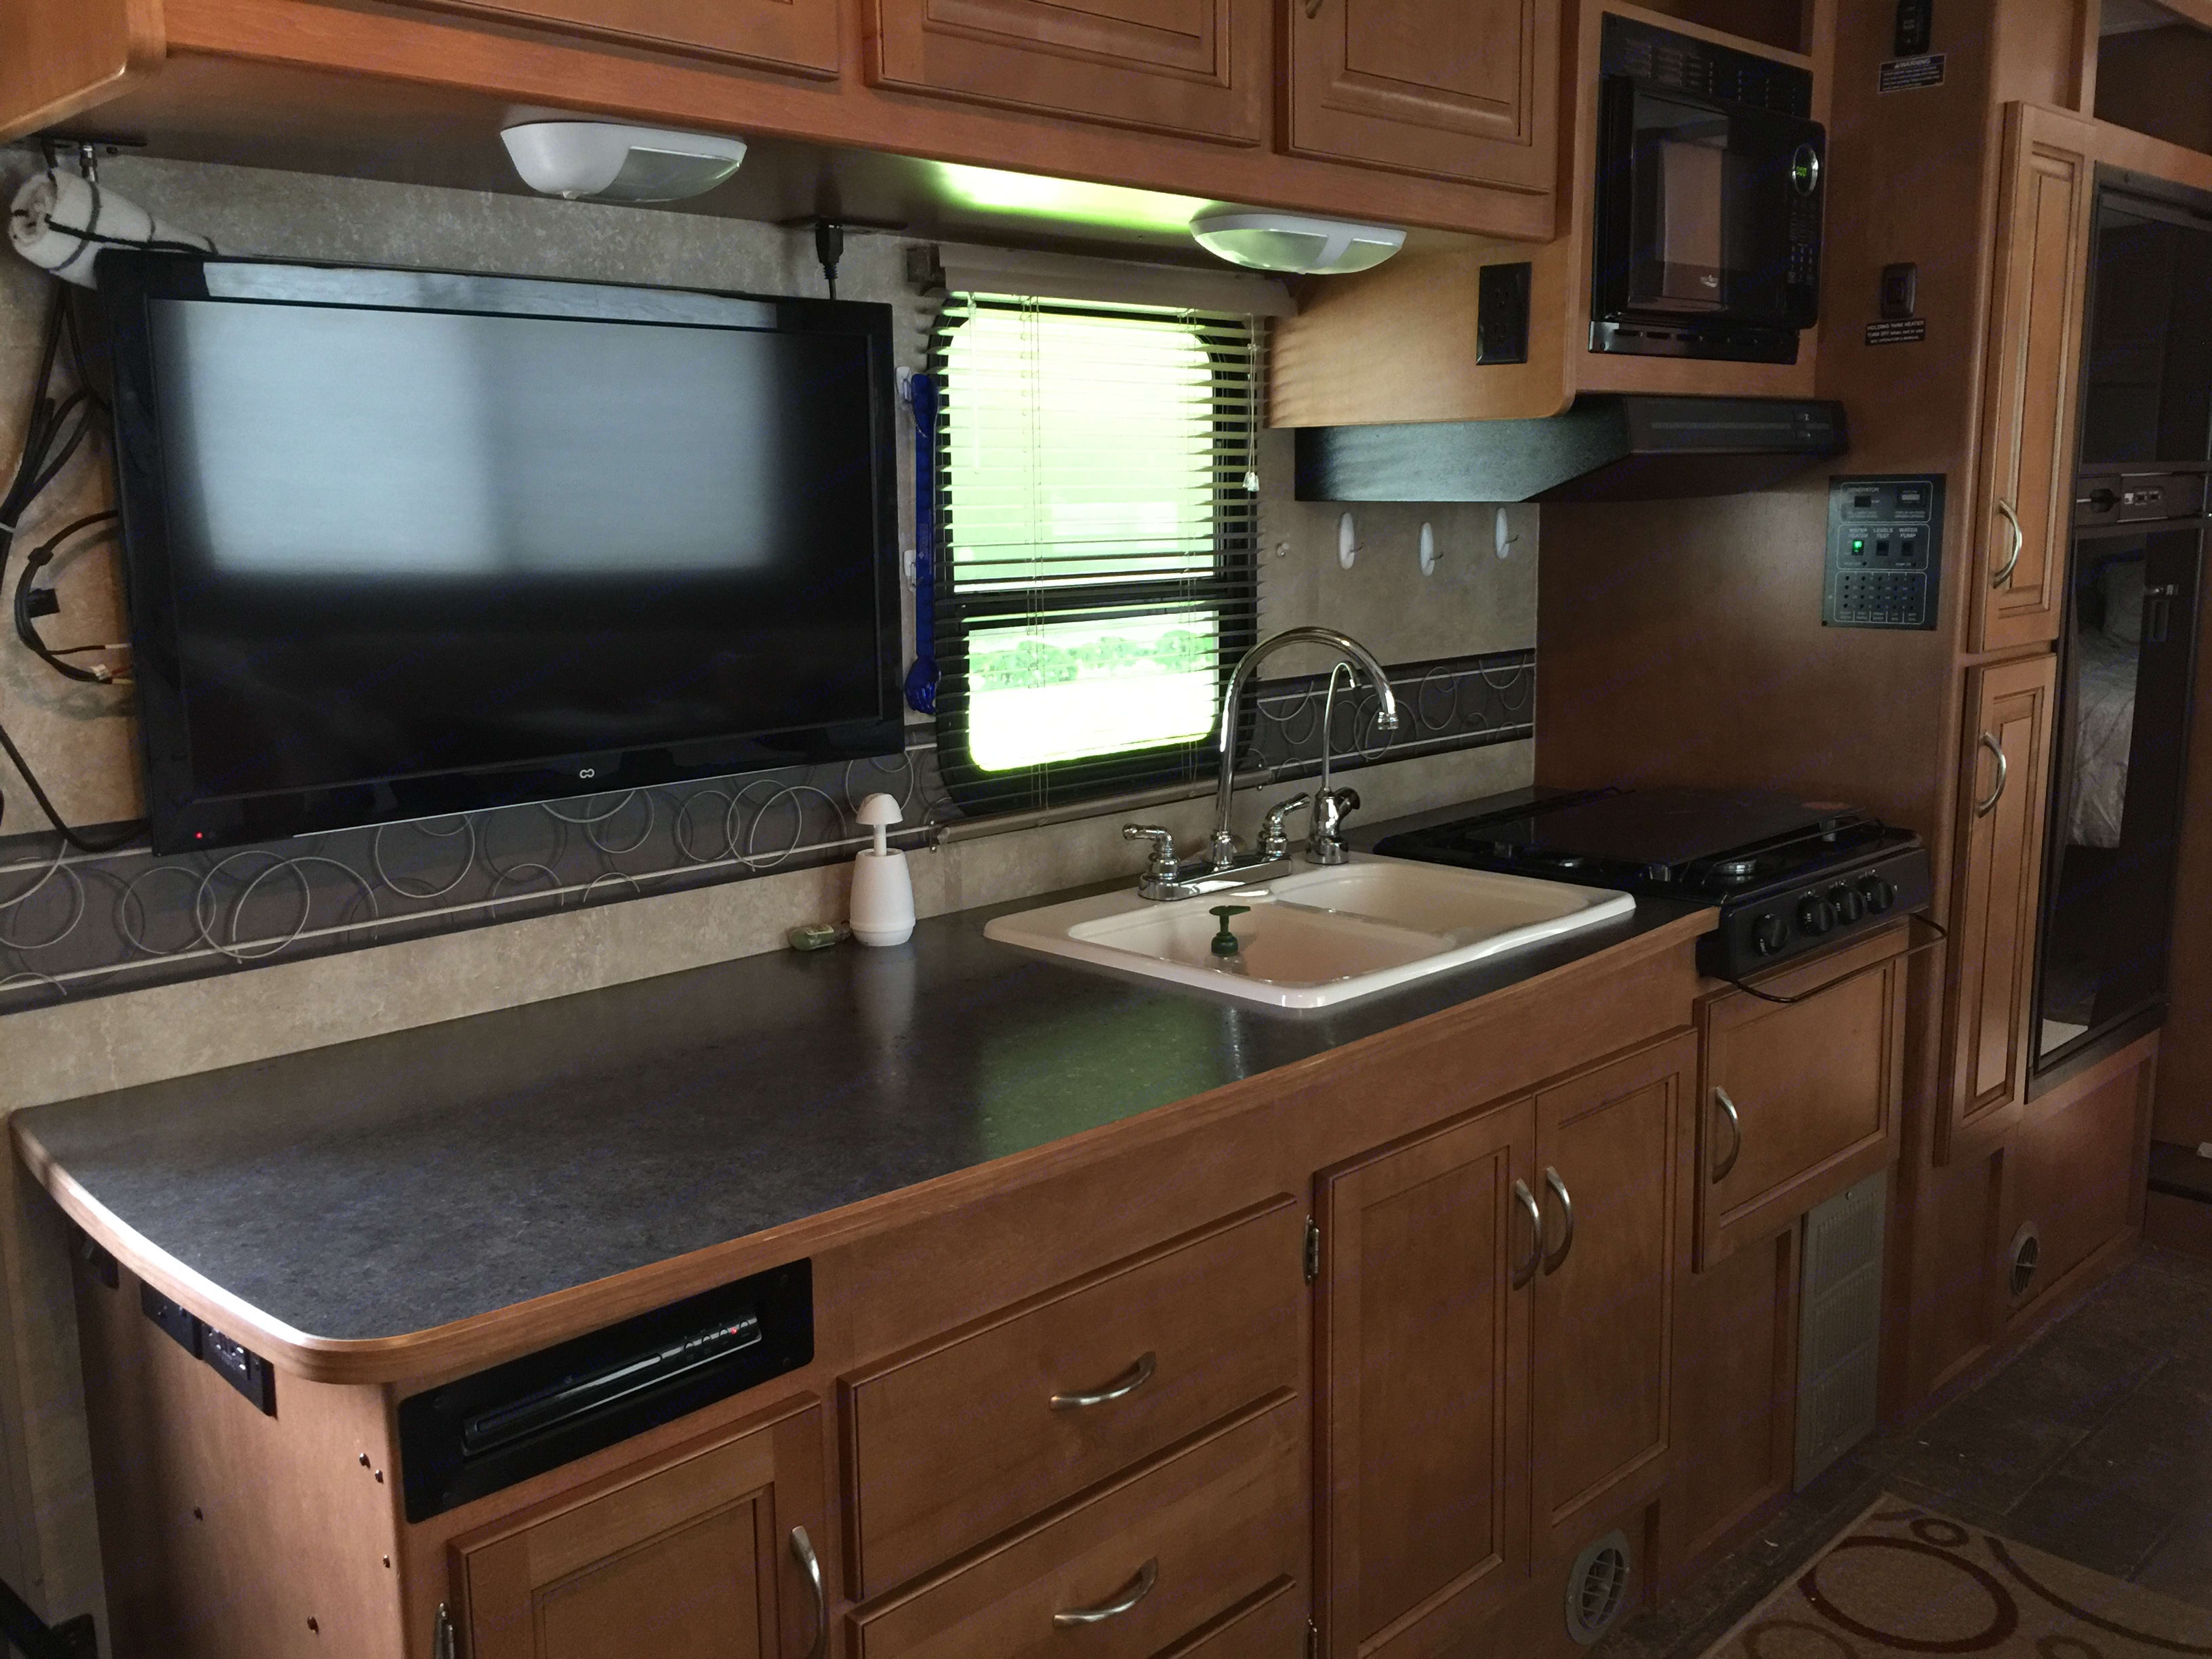 kitchen with pantry, refrigerator, microwave, 3-burner gas stove top TV, dvd player. Winnebago Minnie Winnie 2014